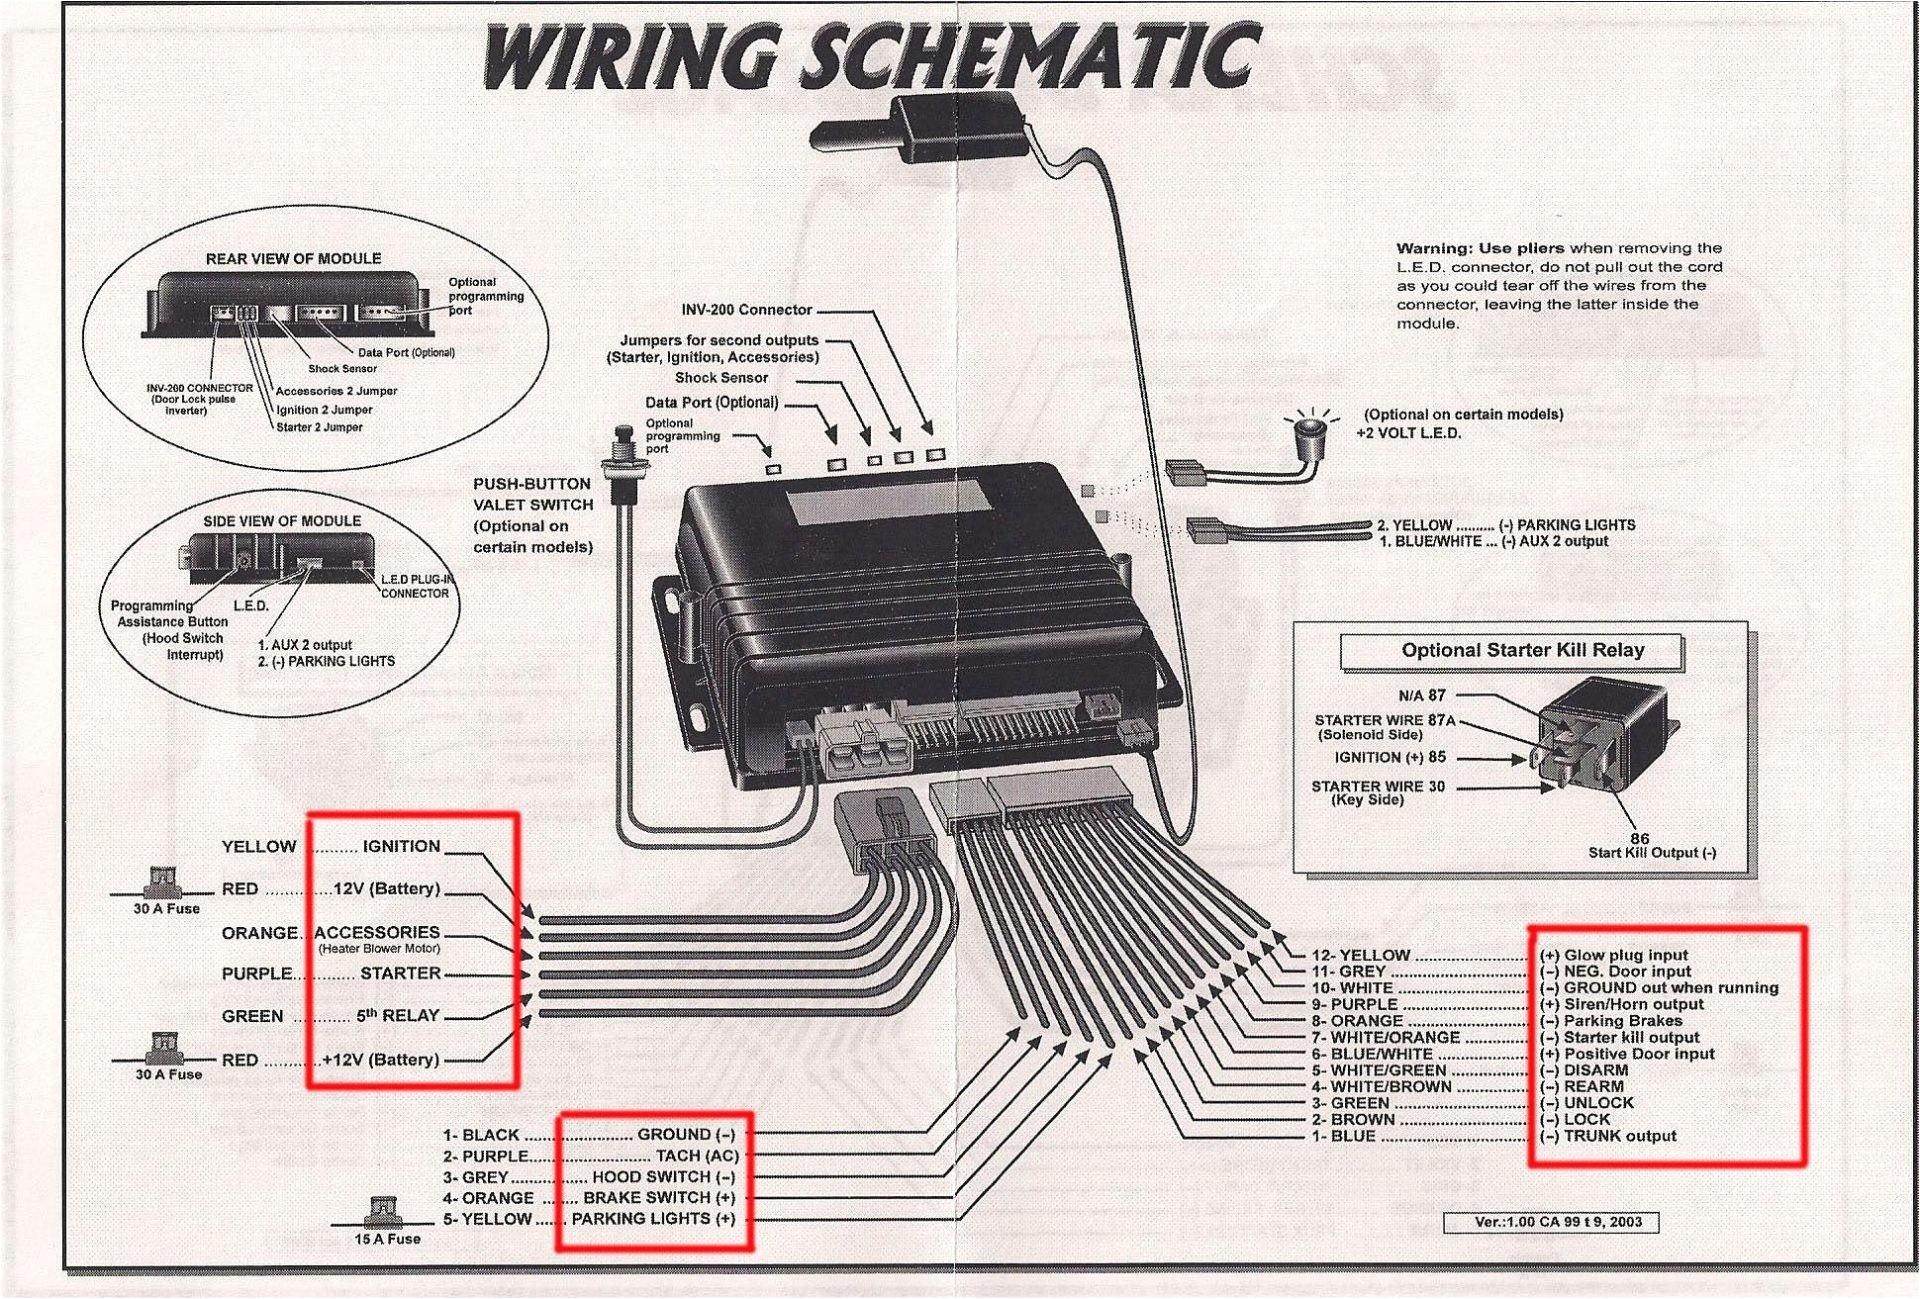 wiring viper diagram alarm car 560vx wiring diagram pos viper 300 alarm schematic